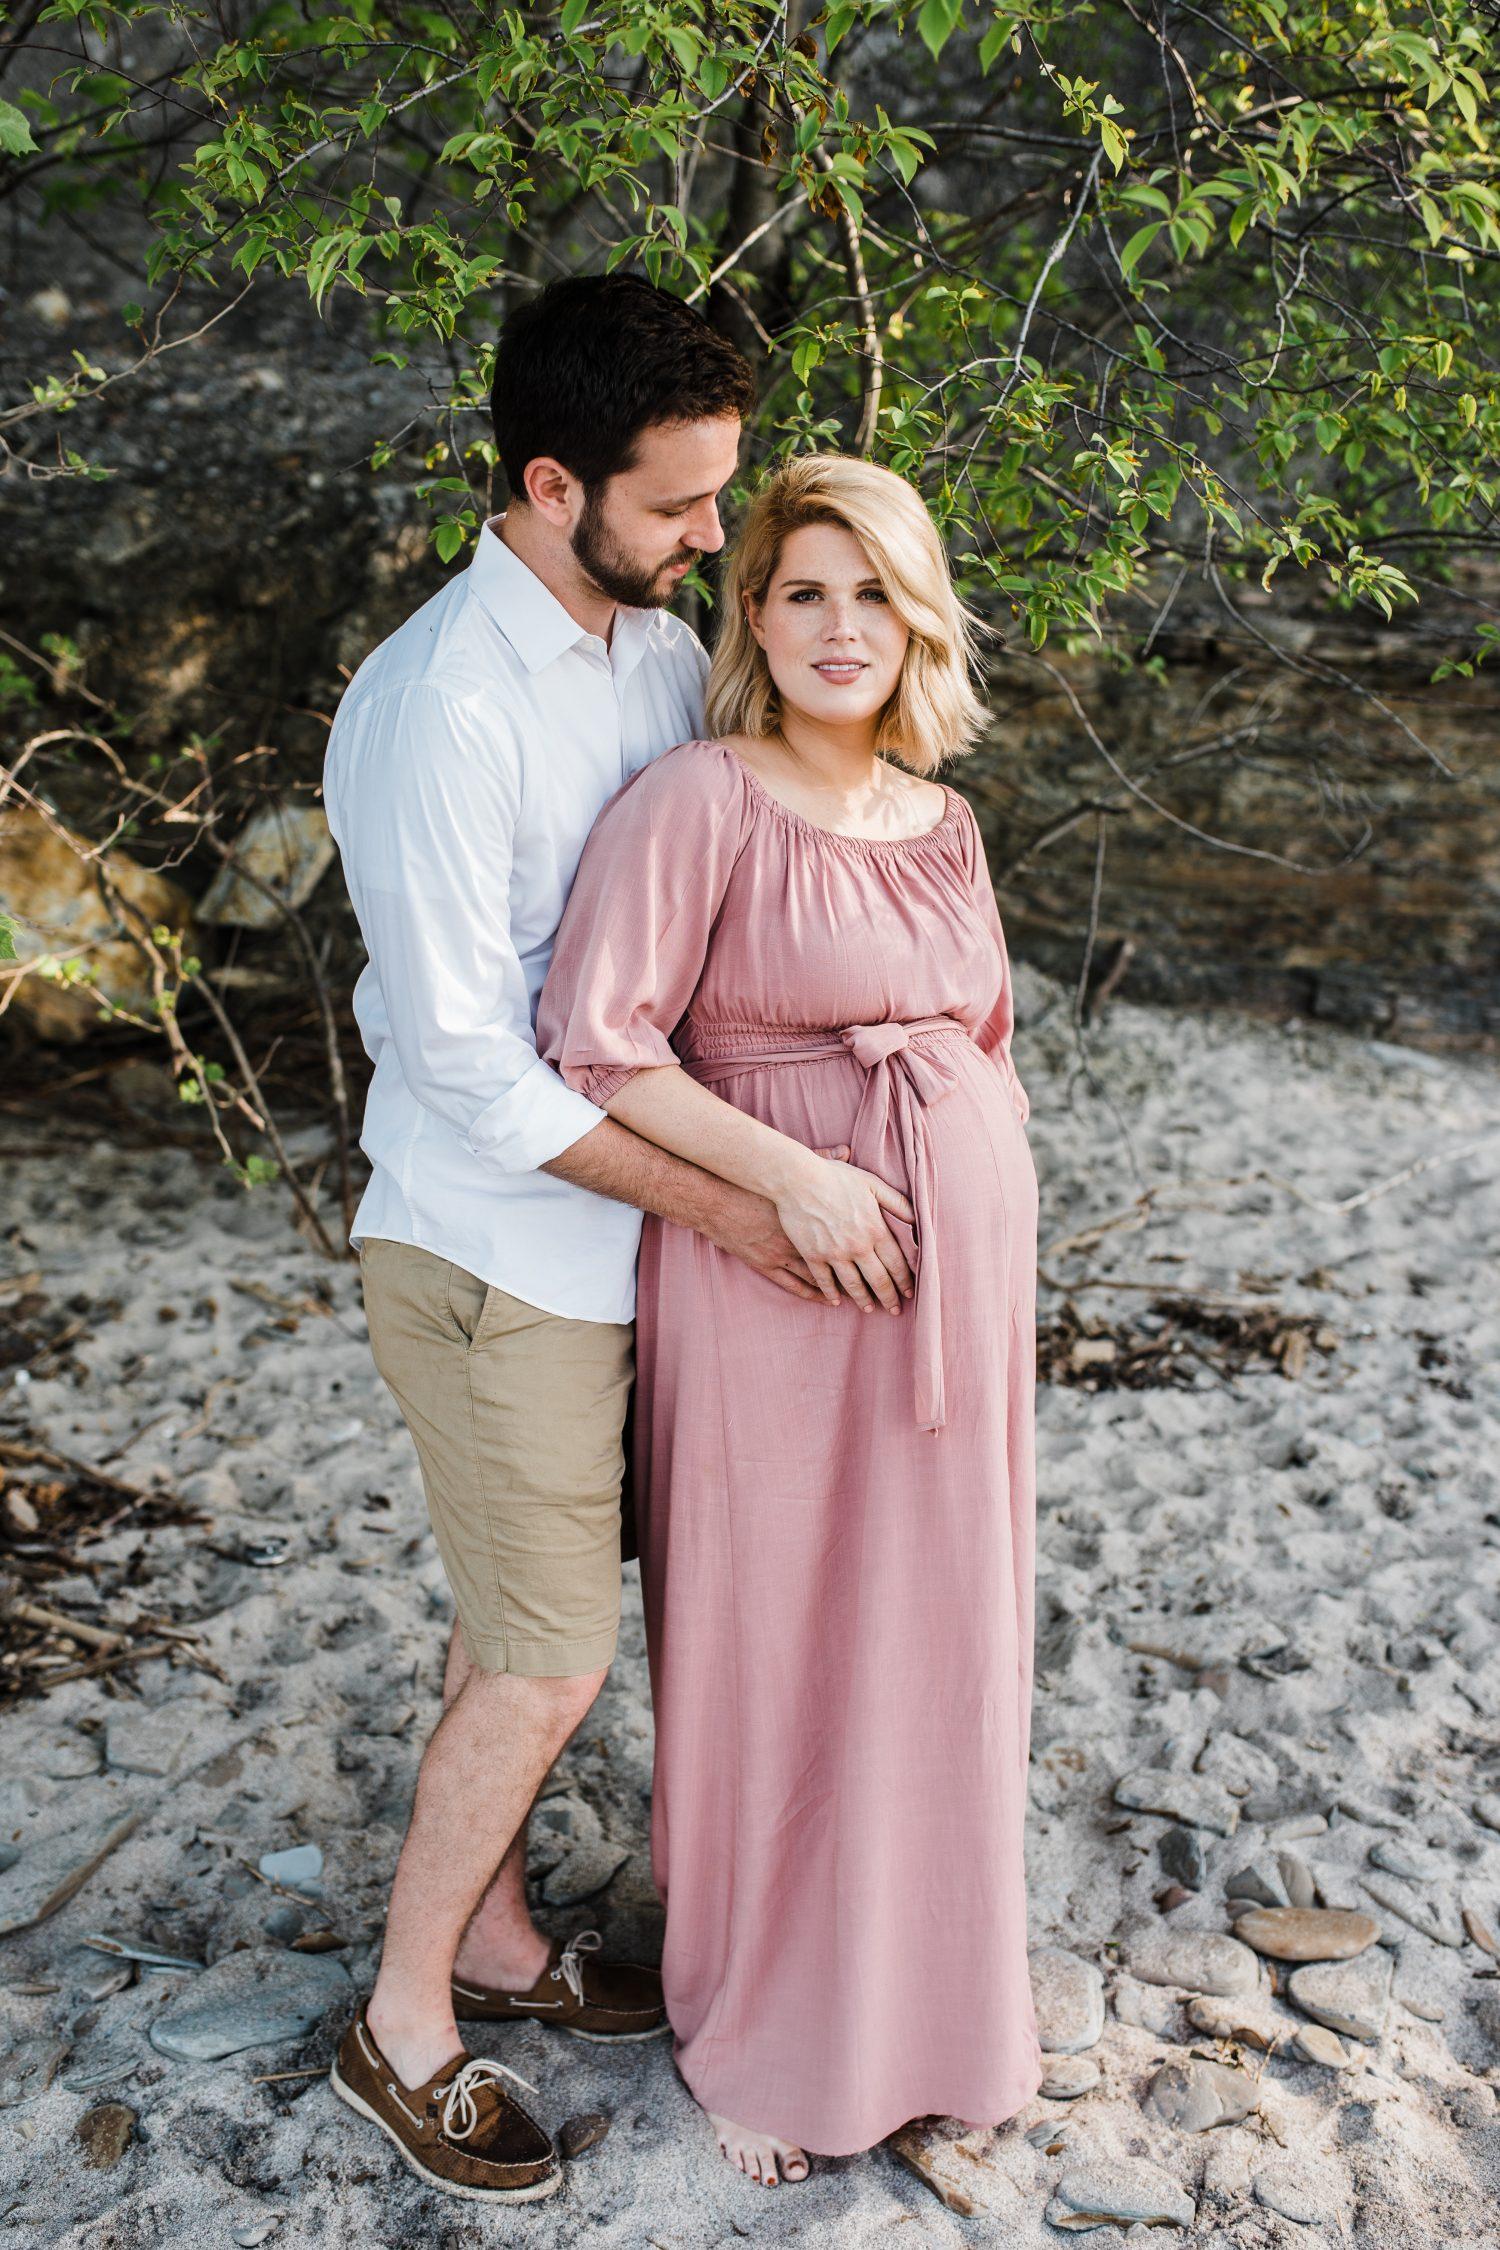 Easterday Creative | Adventurous wedding photographer and storyteller | Serving North Carolina, South Carolina and beyond | Beach maternity session